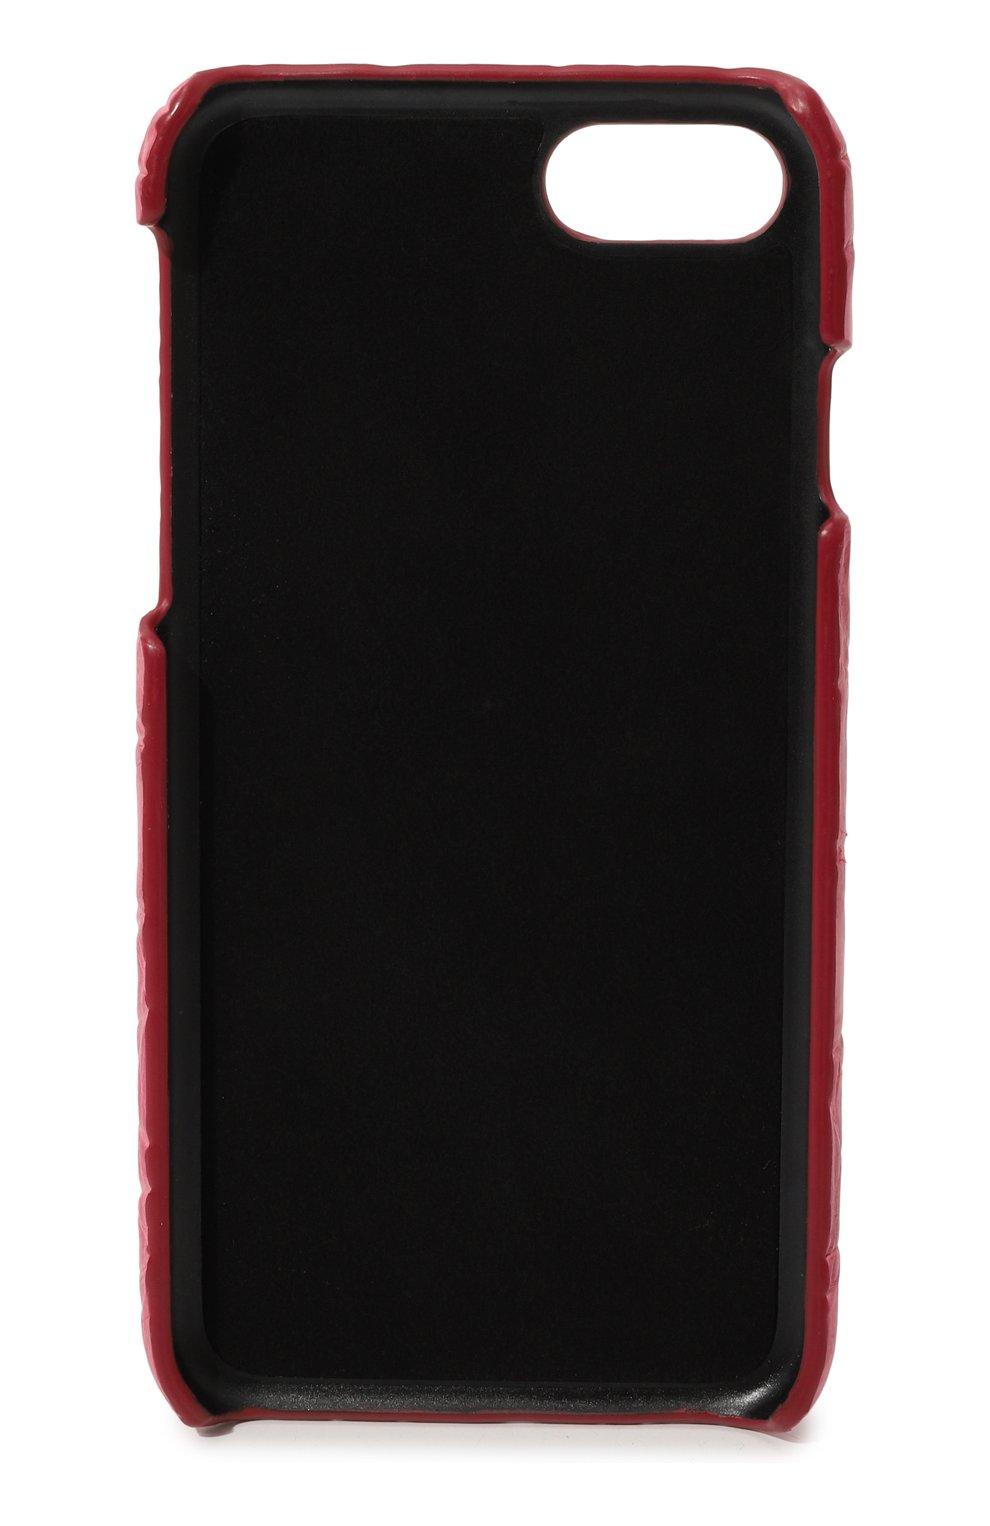 Чехол для iPhone 7 из кожи крокодила | Фото №2